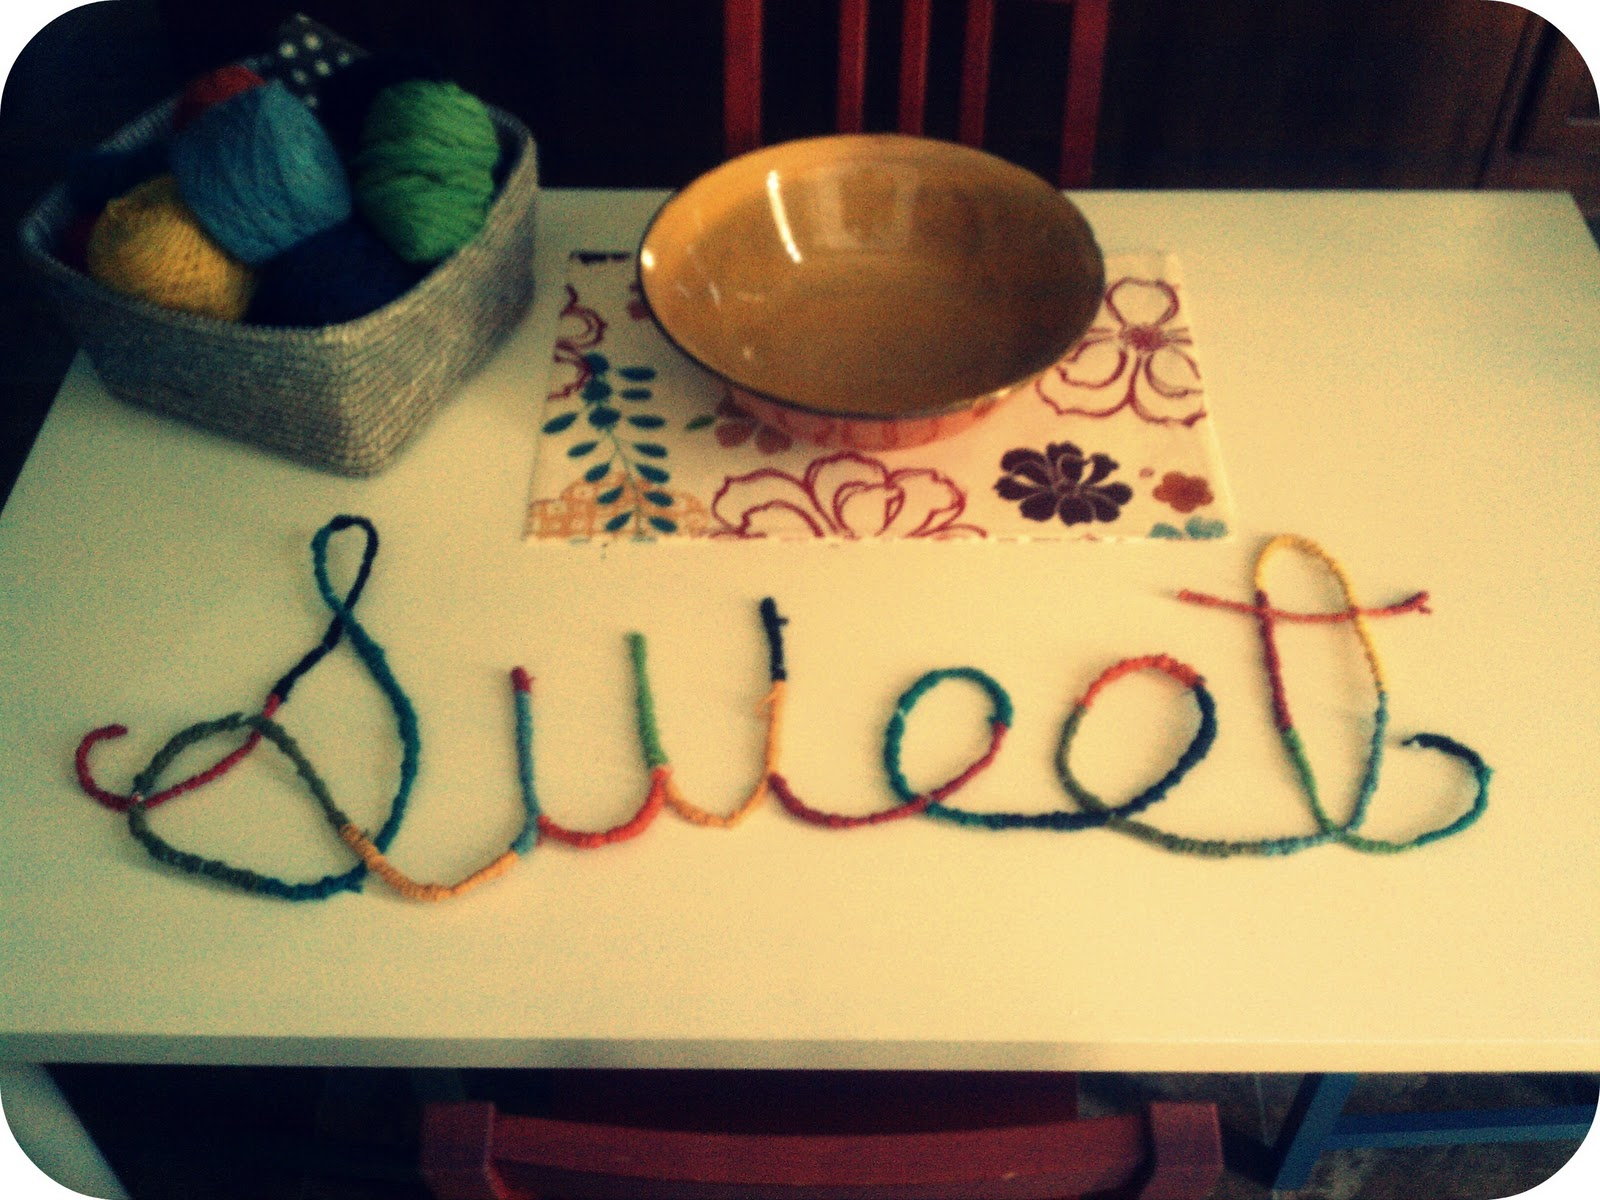 http://1.bp.blogspot.com/-_s7R_yuApjE/ToXgk0khCbI/AAAAAAAAGBs/o3FuIiMfLNI/s1600/sweet.jpg